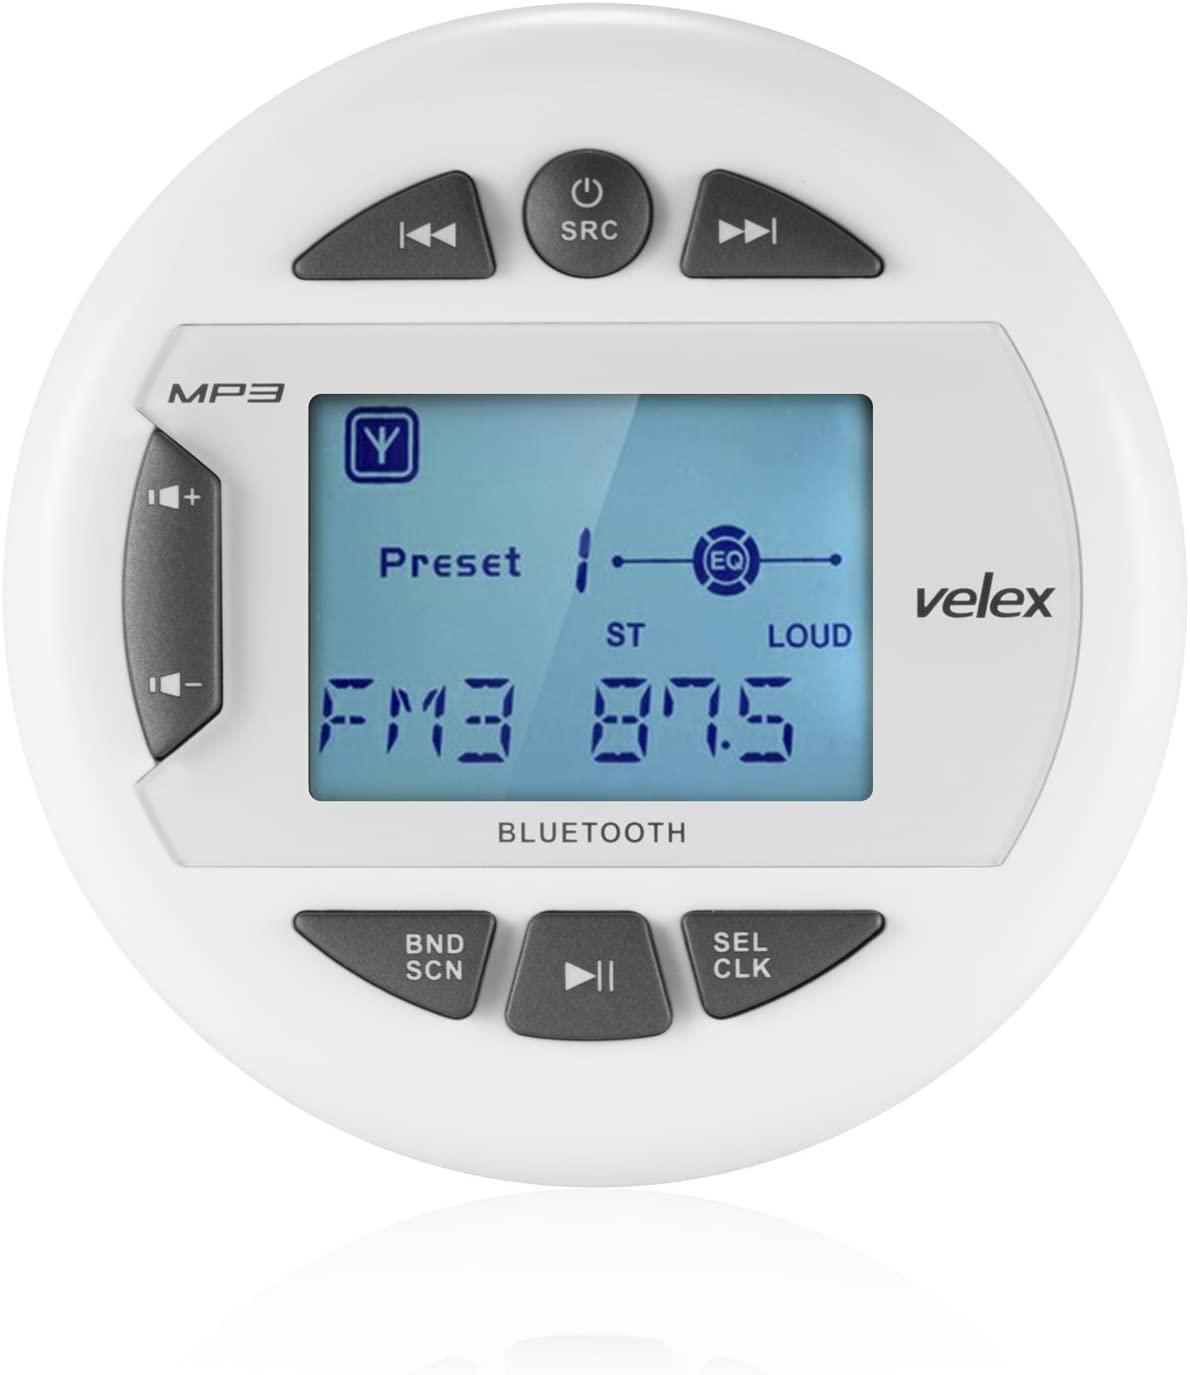 Marine Stereo by Velex, in-Dash, Marine Gauge, Bluetooth, Digital Media MP3 / WMA/USB/AM/FM Weather-Proof Marine Stereo, (No CD Player)